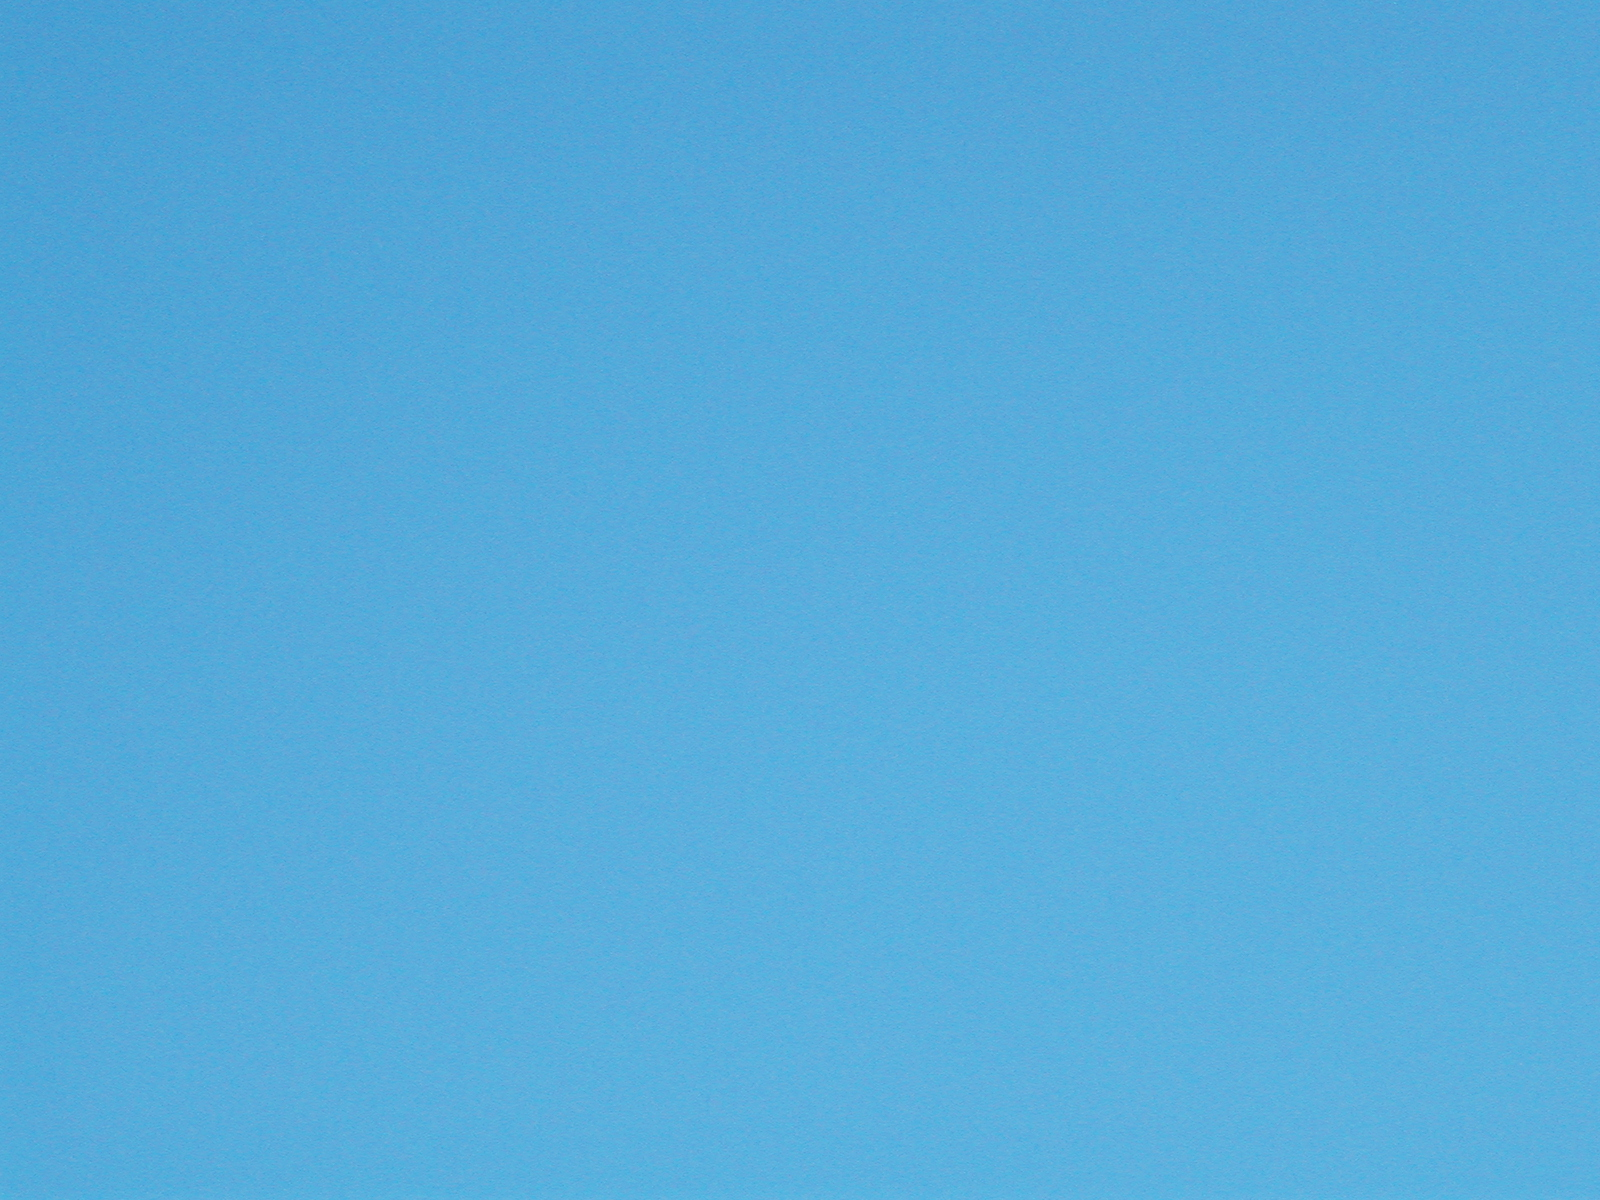 Fond Decran Bleu Turquoise Uni - Fond d'écran Wallpapers